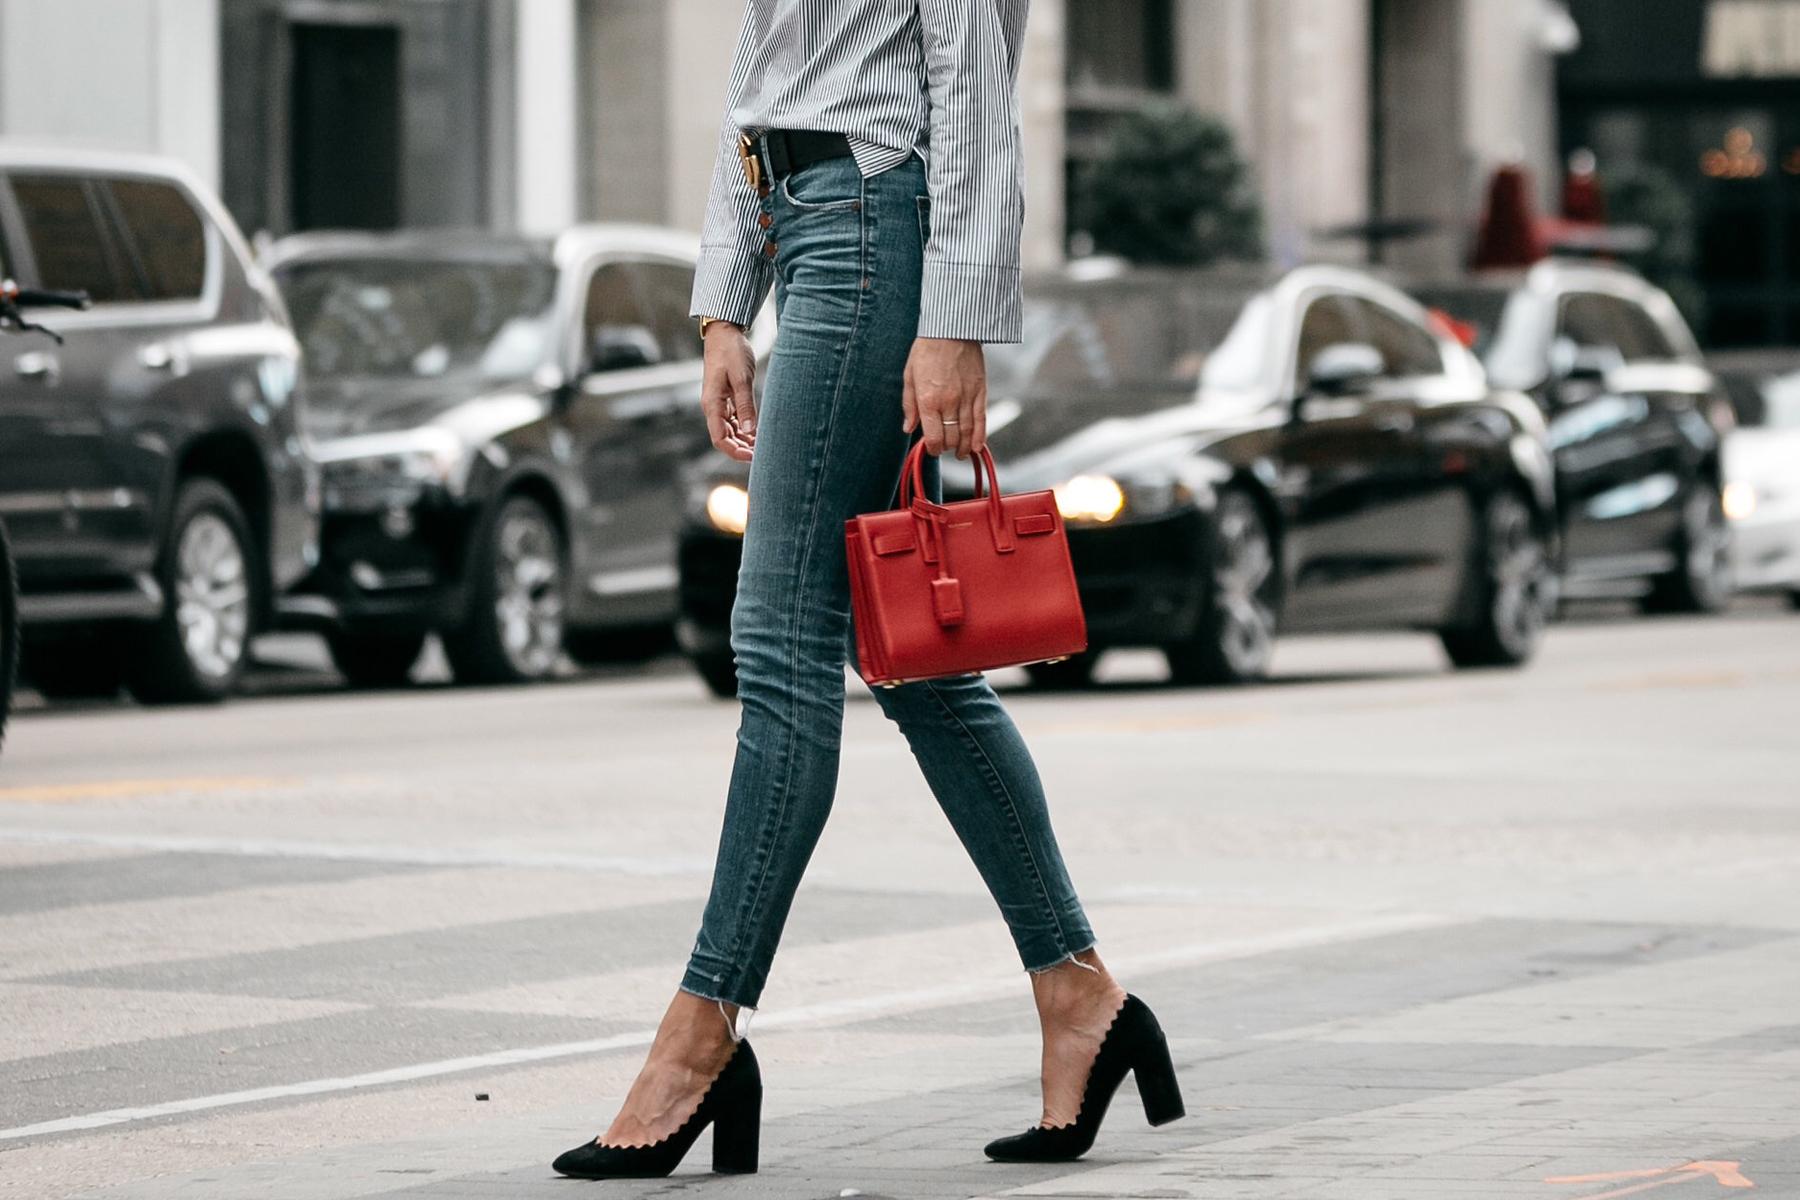 Denim Skinny Jeans Gucci Belt Saint Laurent Sac De Jour Mini Red Fashion Jackson Dallas Blogger Fashion Blogger Street Style